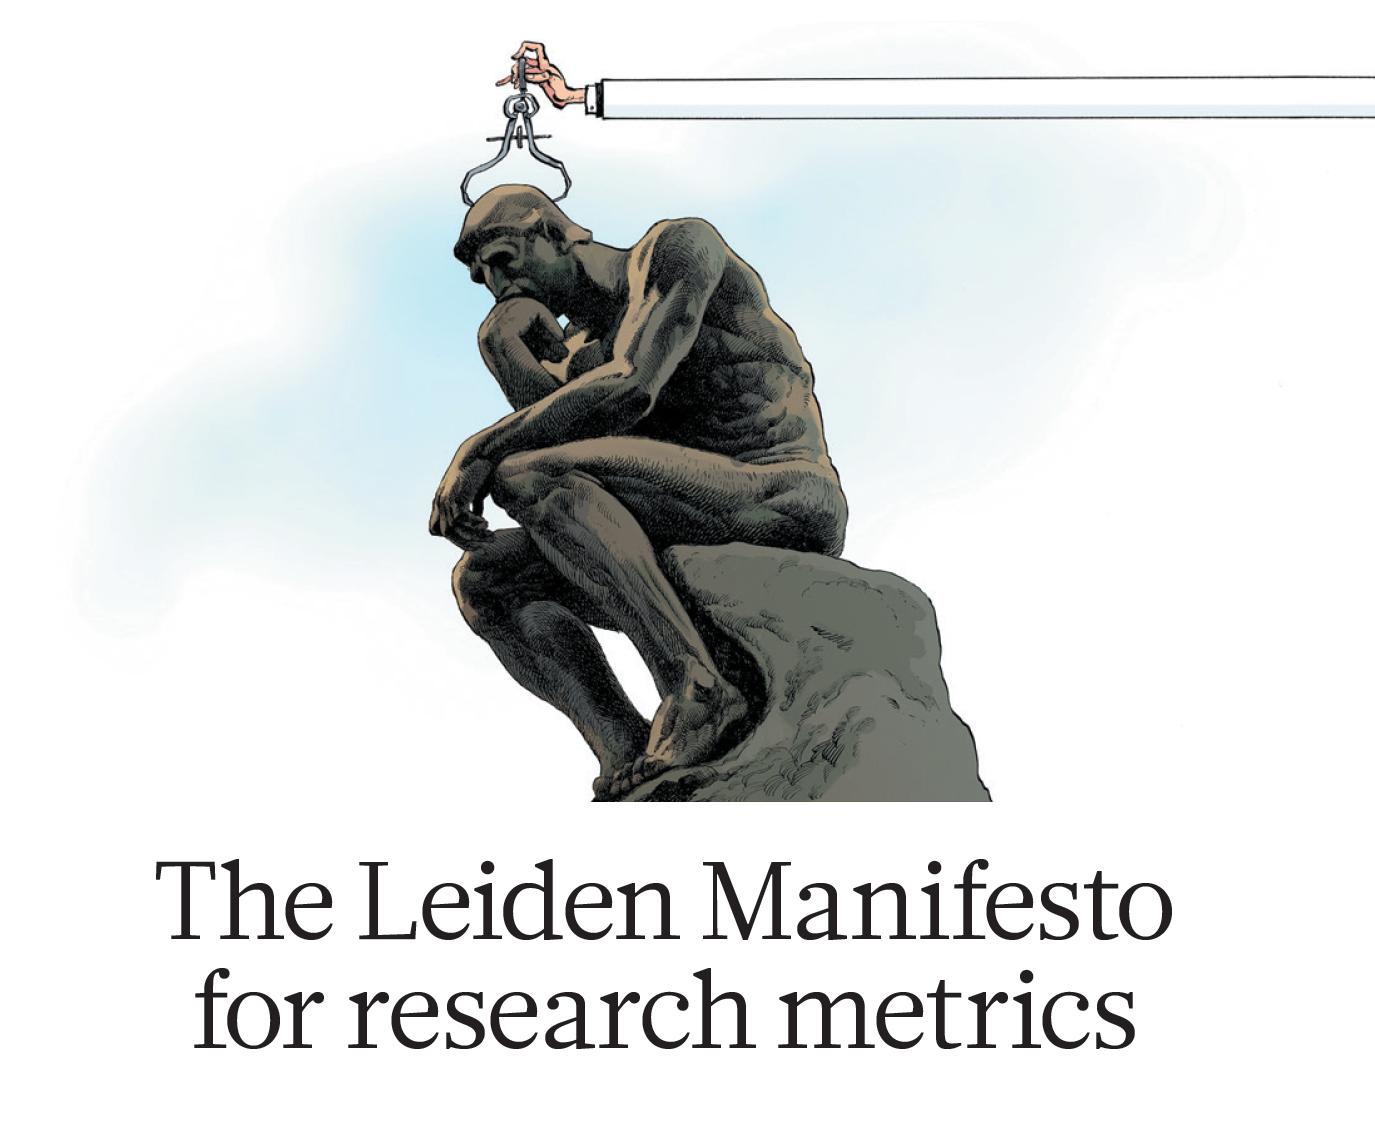 ResearchMetrics